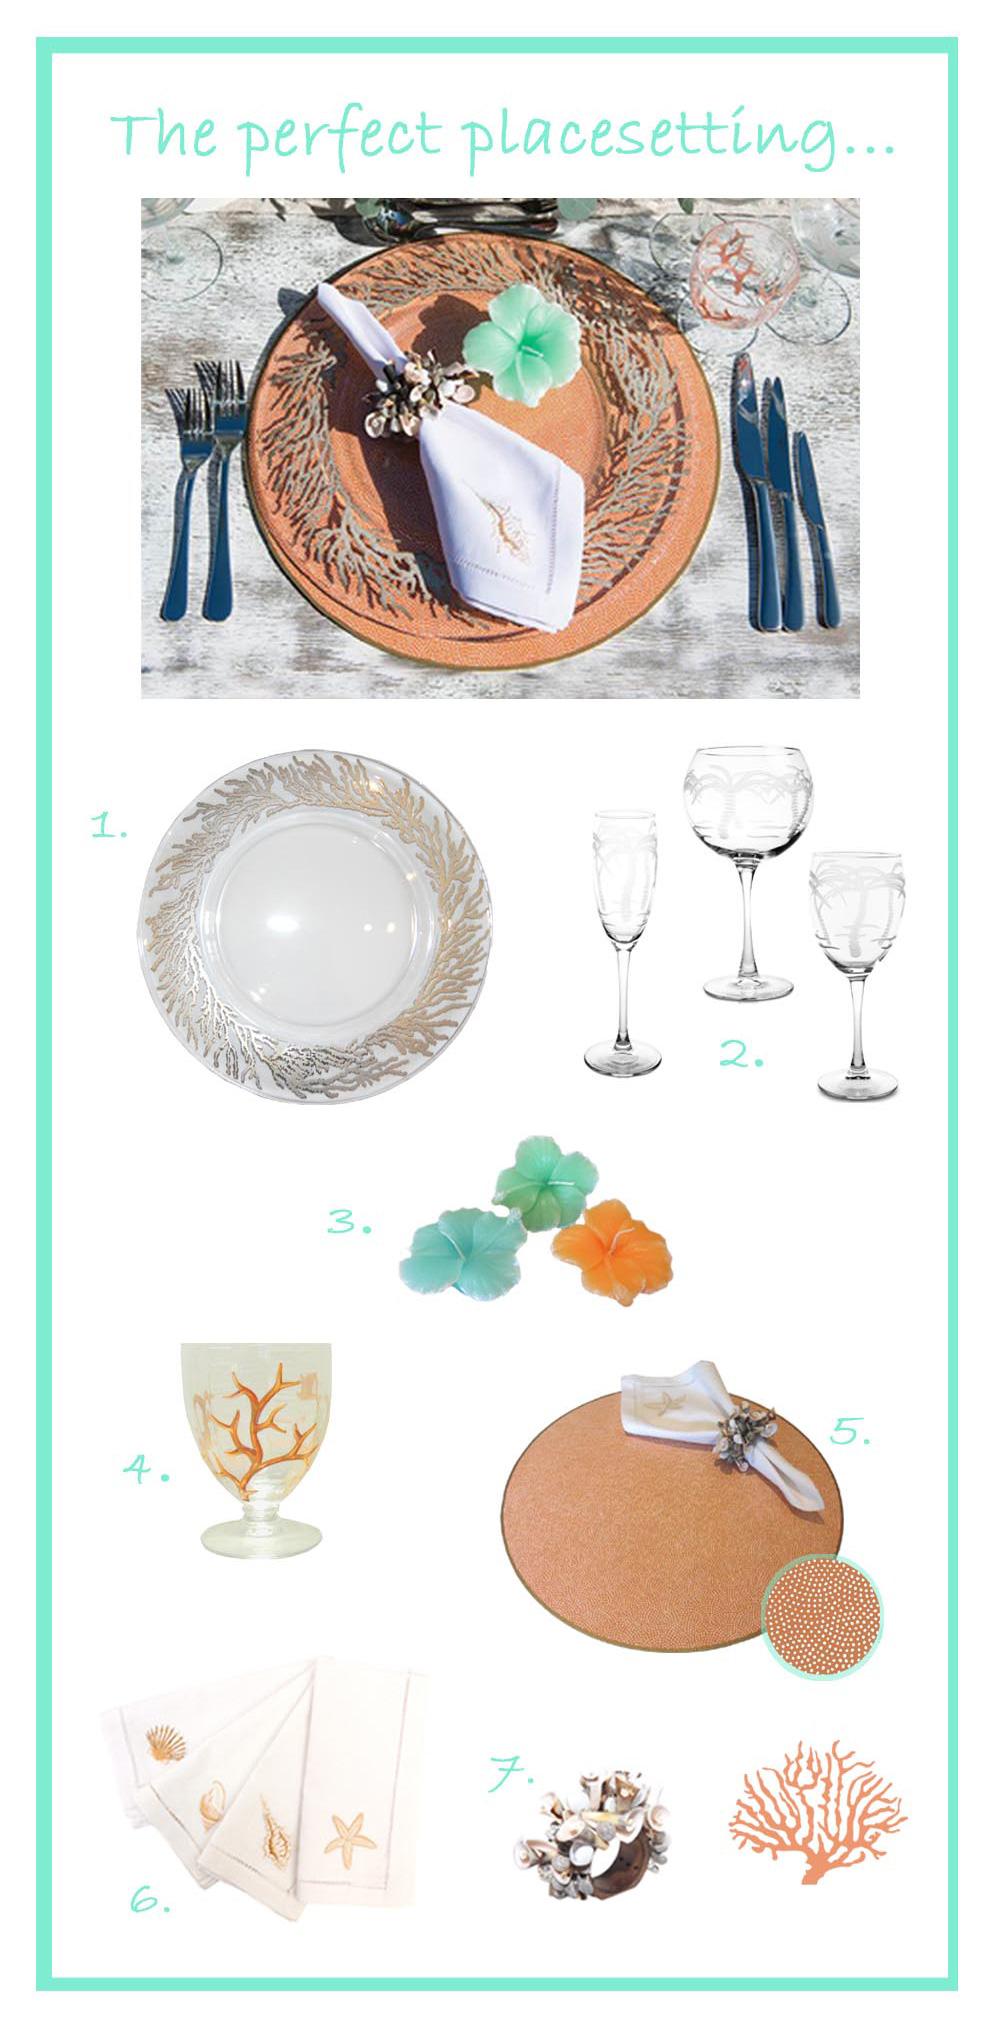 Jenny Blanc - Barbados Wedding Place Setting